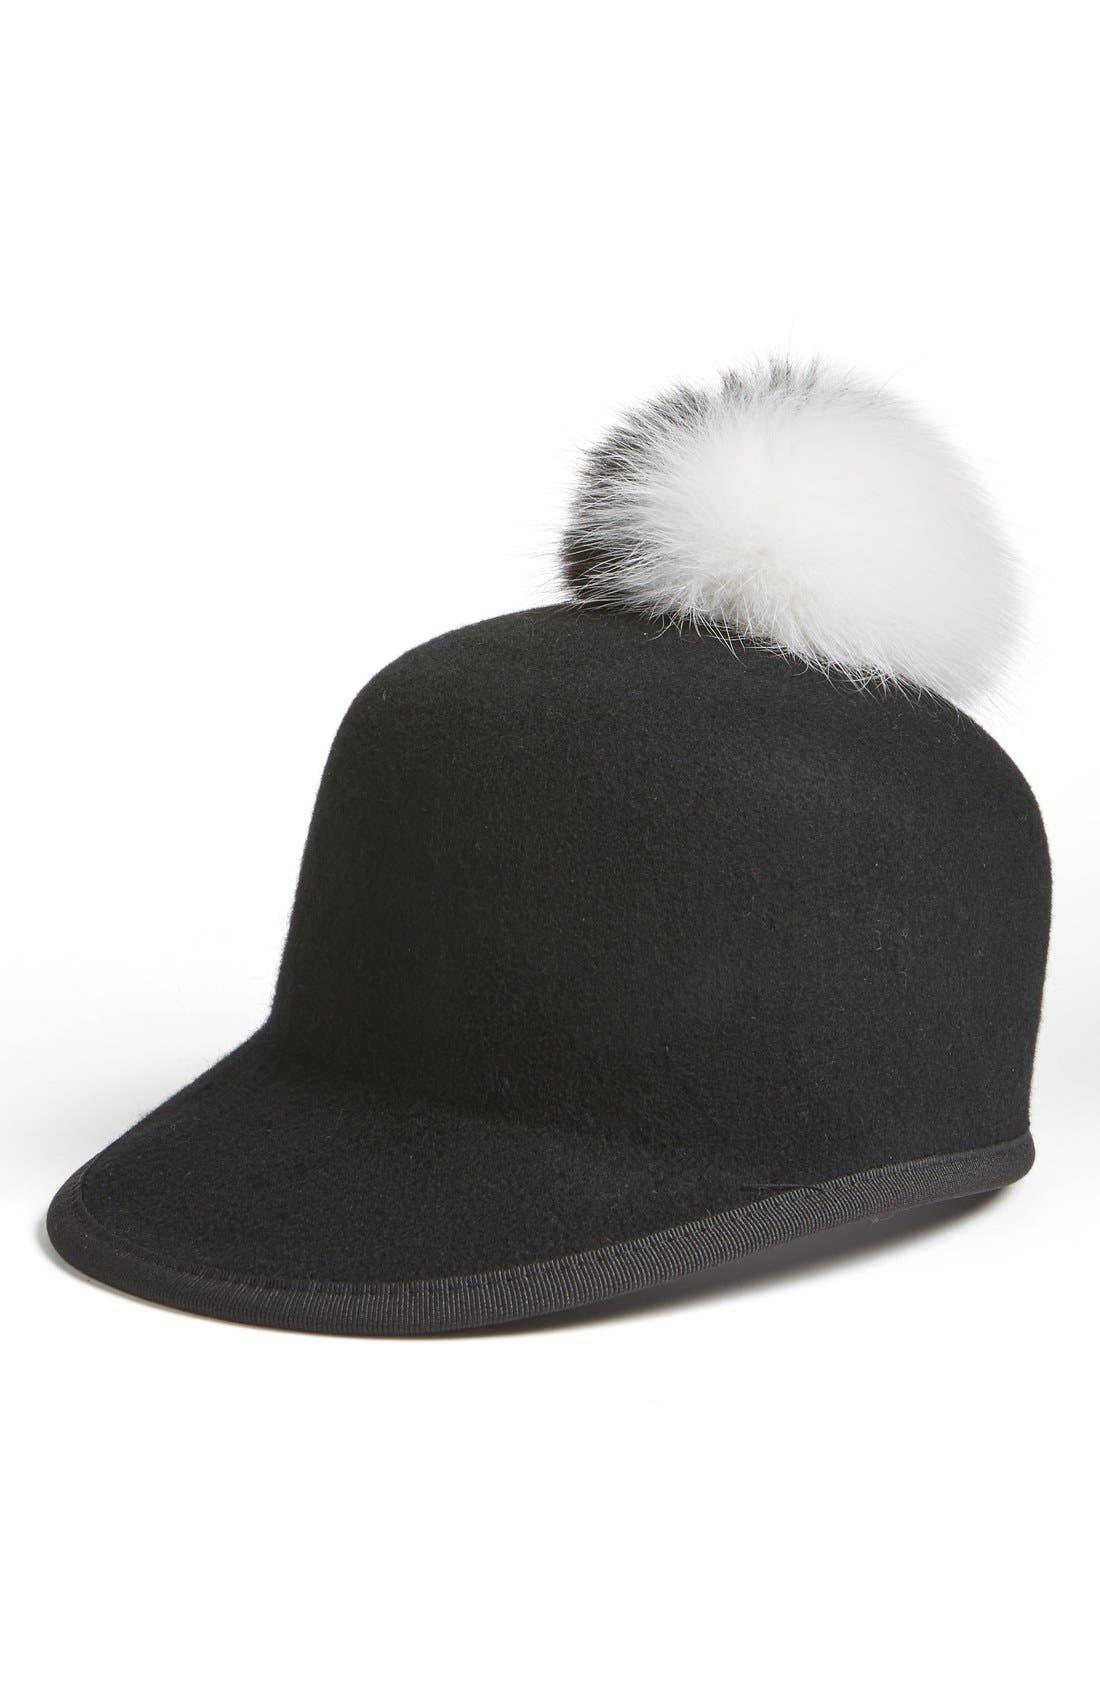 Main Image - Helene Berman Genuine Fox Fur Pompom & Wool Cap